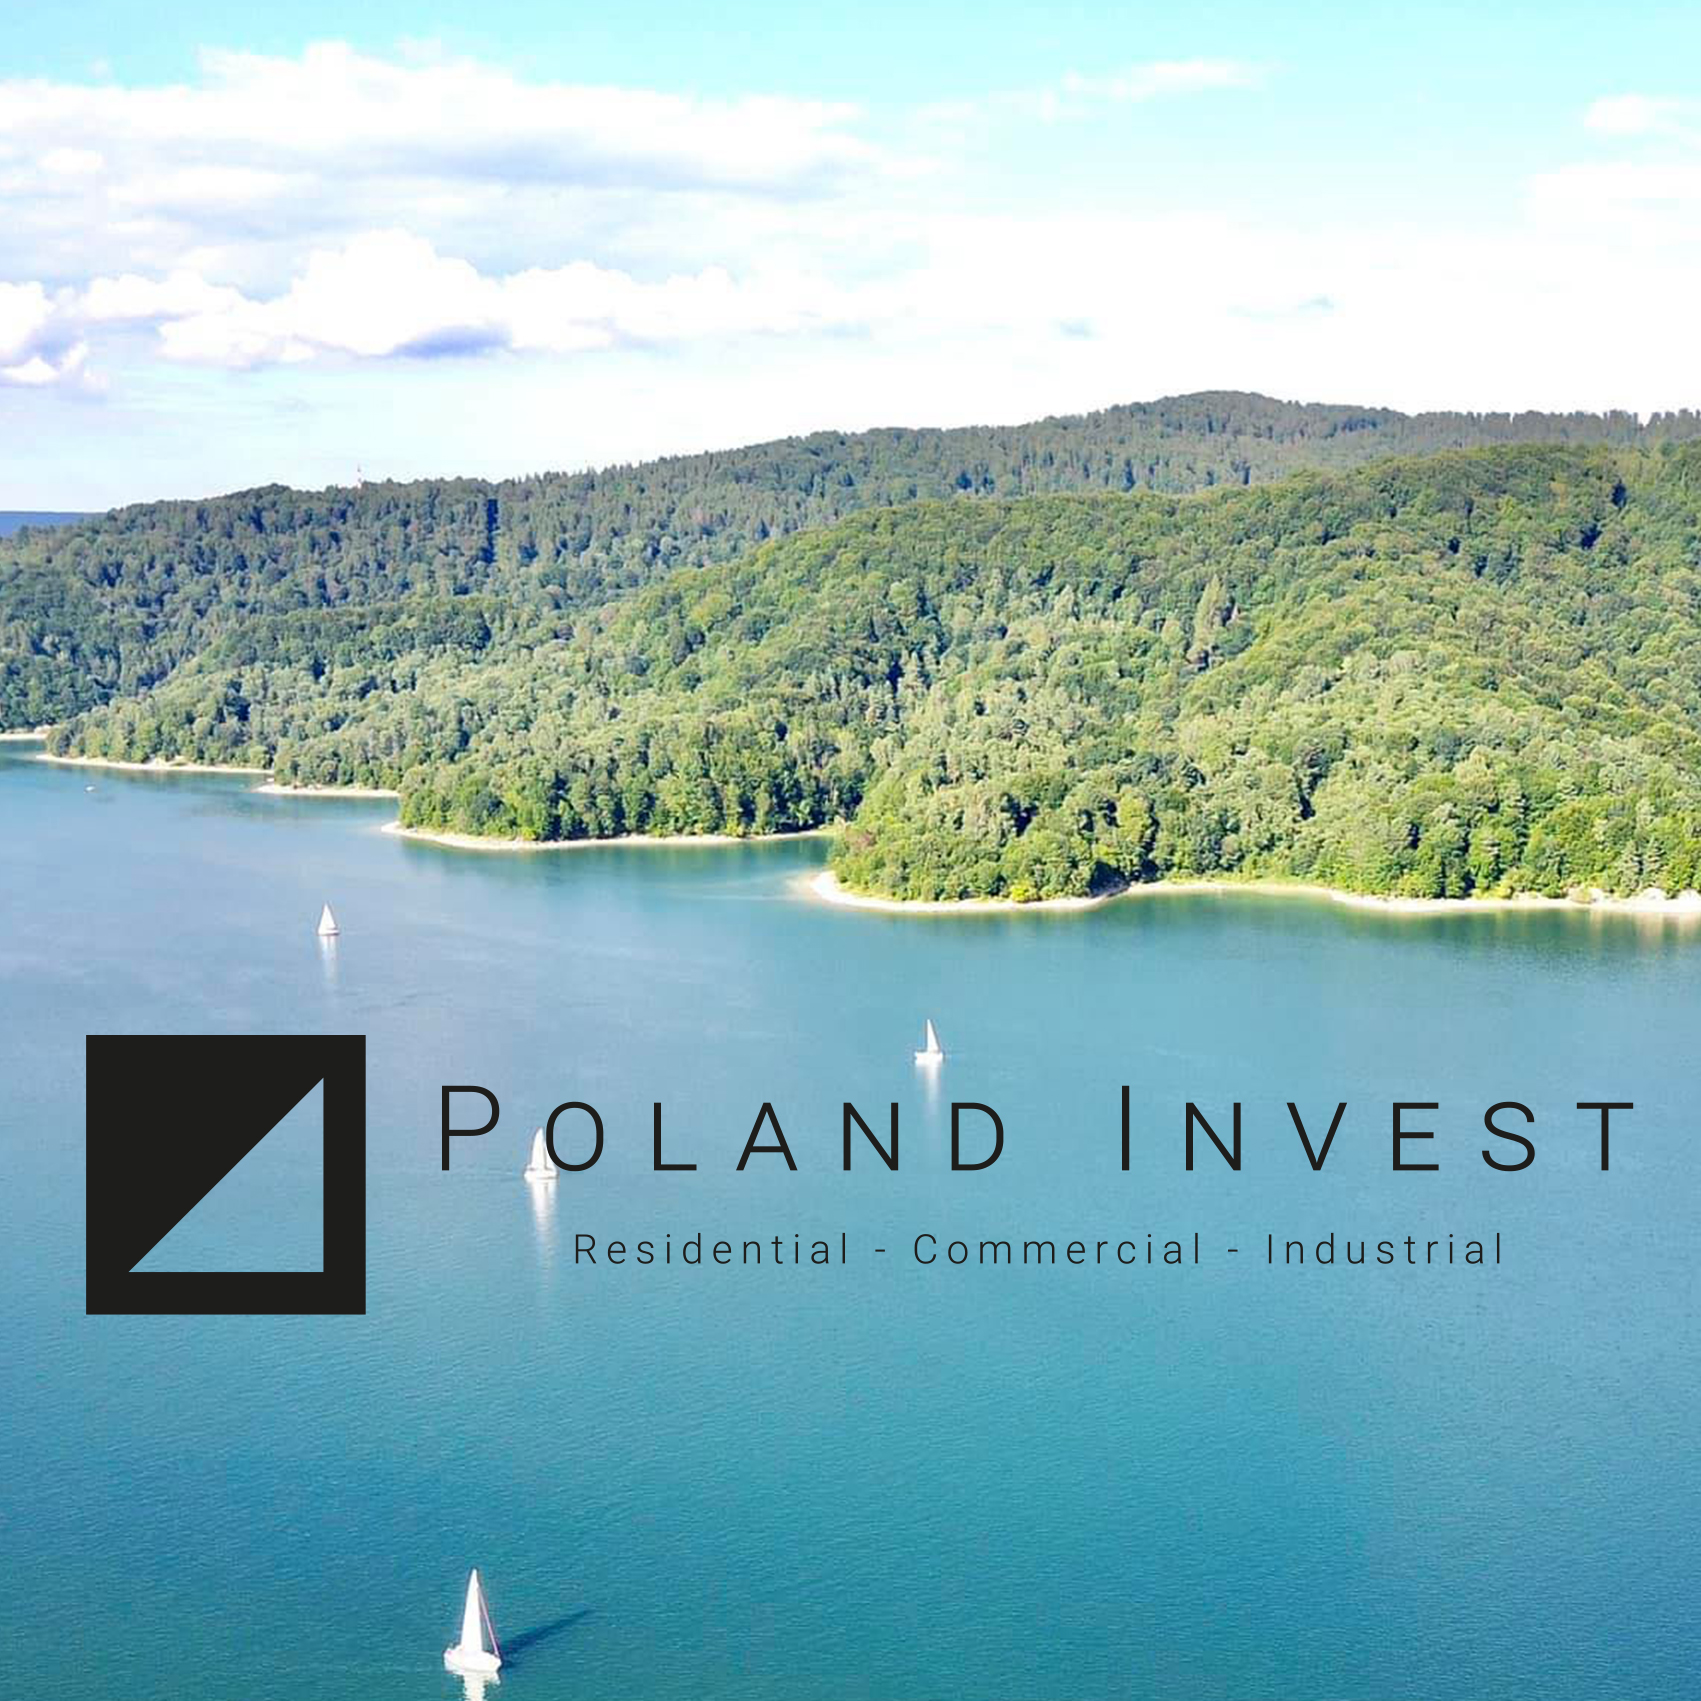 Poland Invest